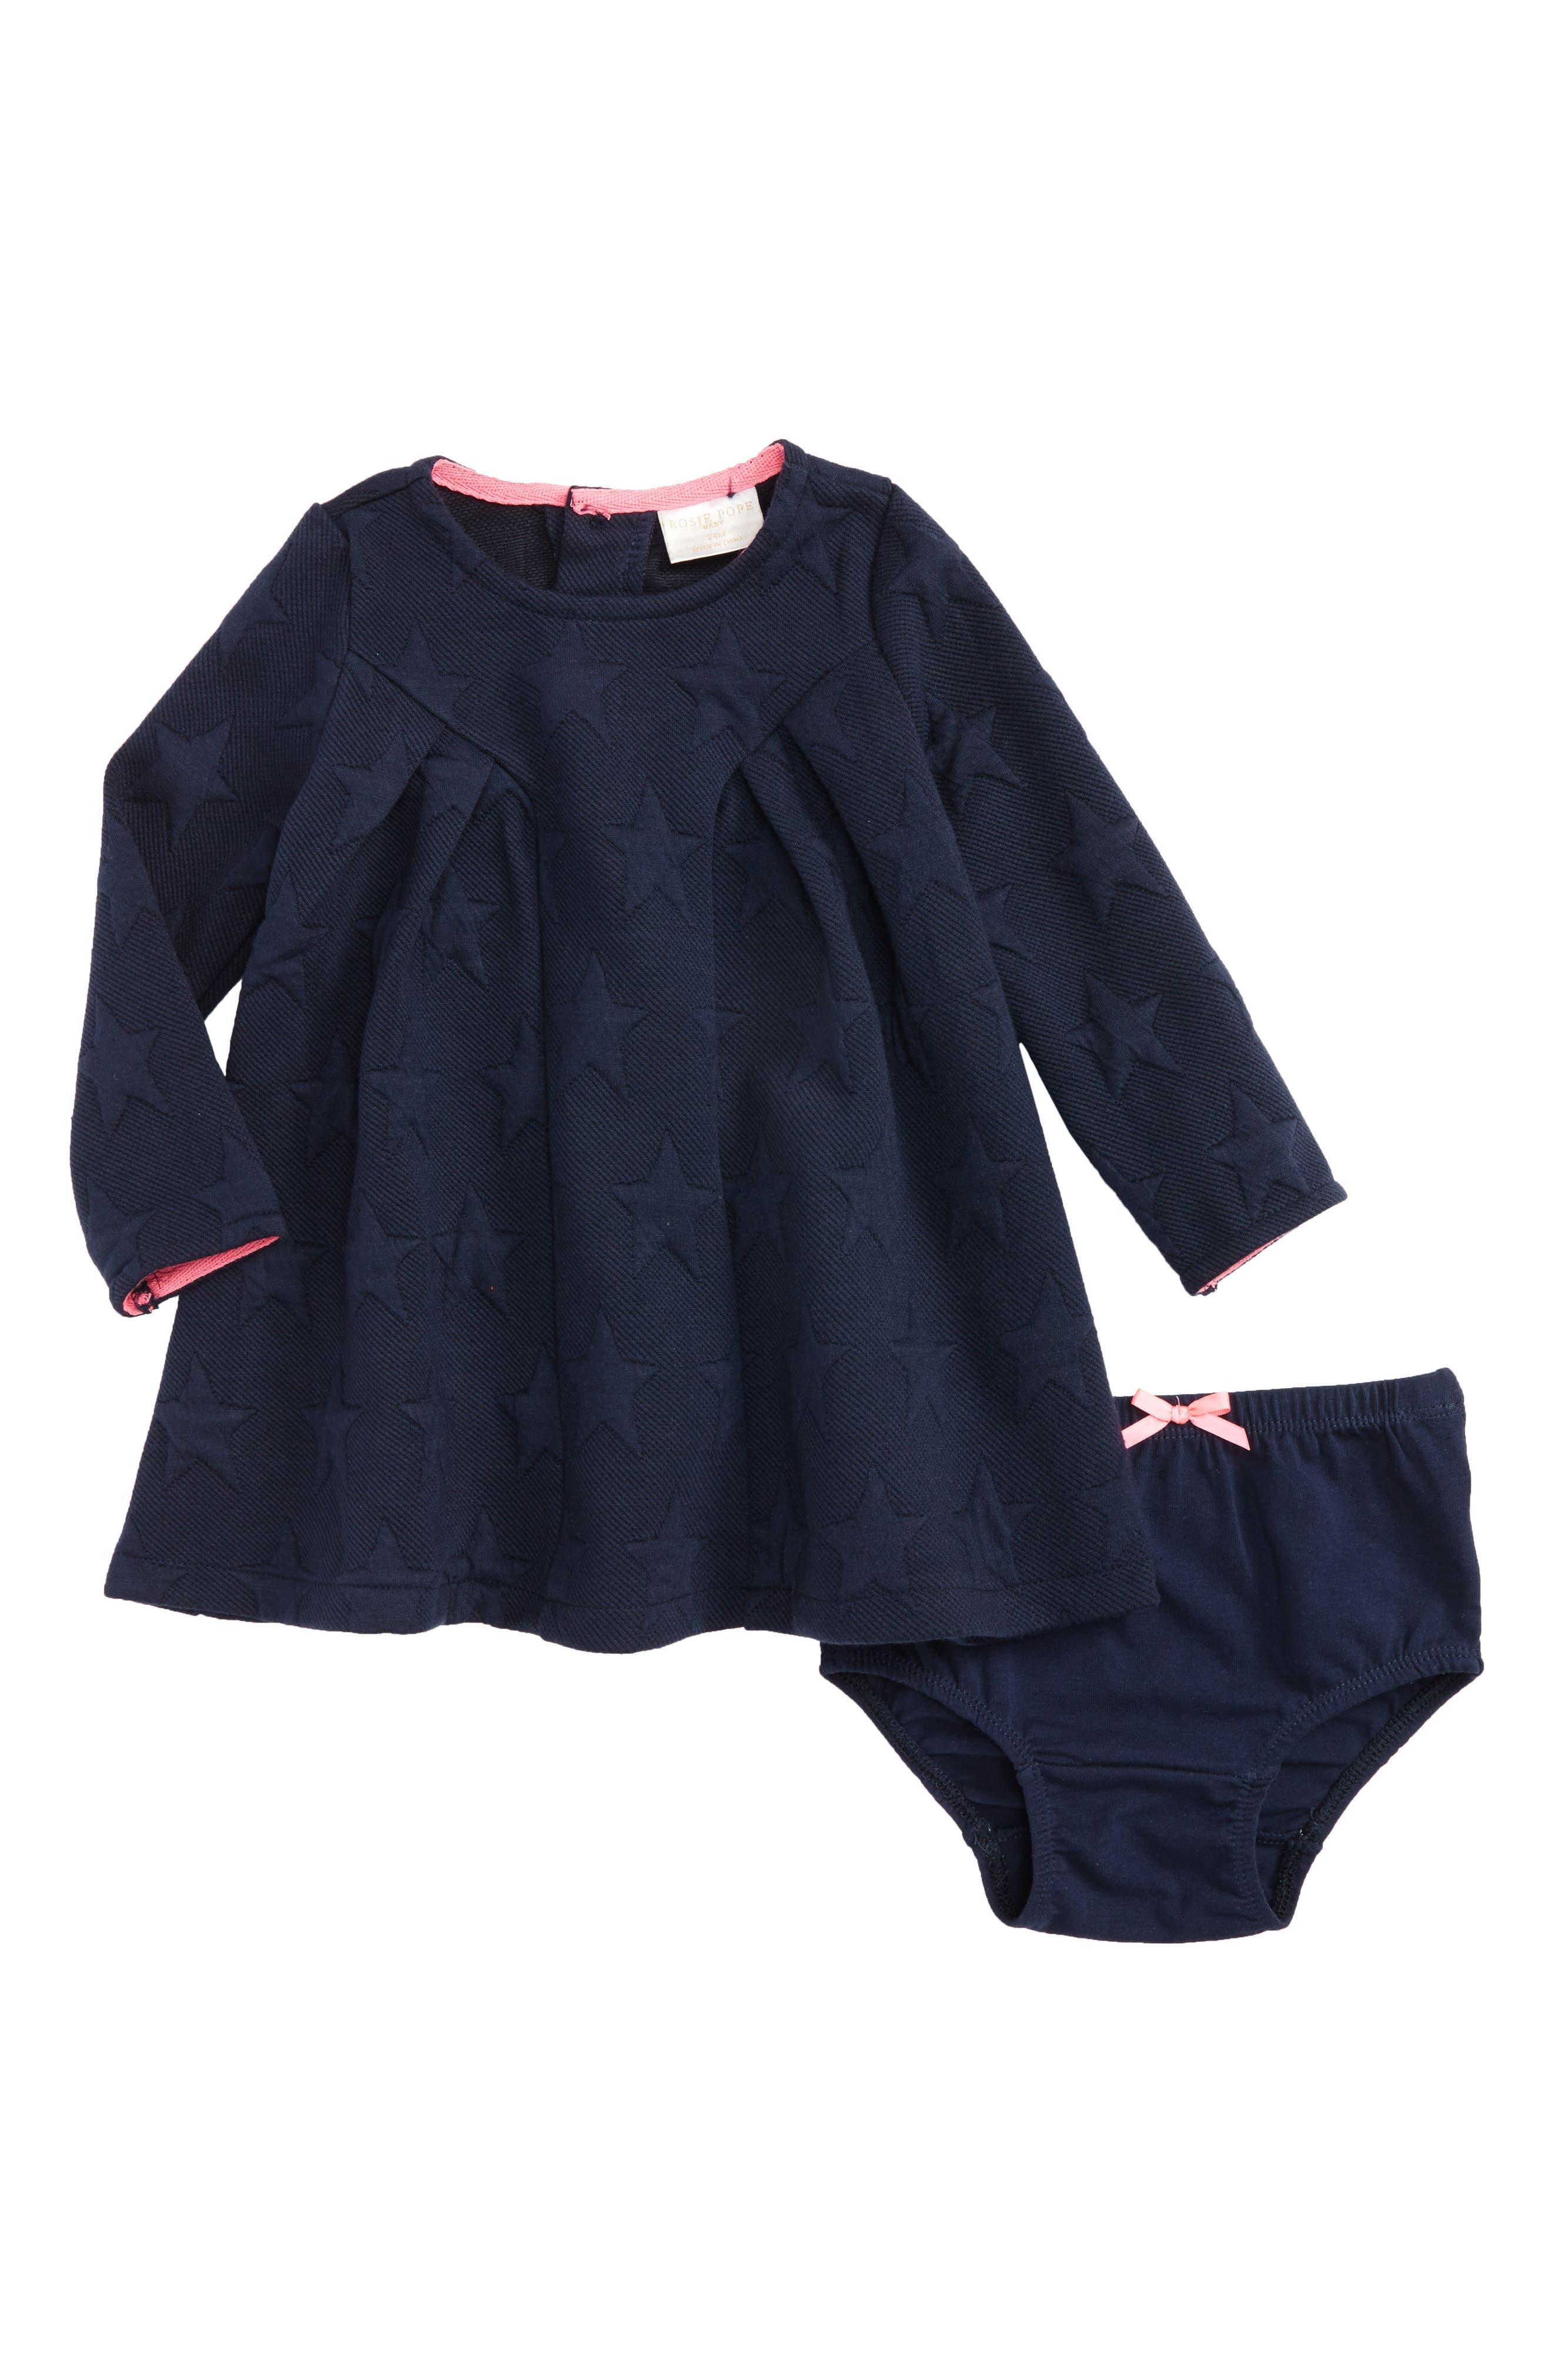 Rosie Pope 3D Star Dress (Baby Girls)